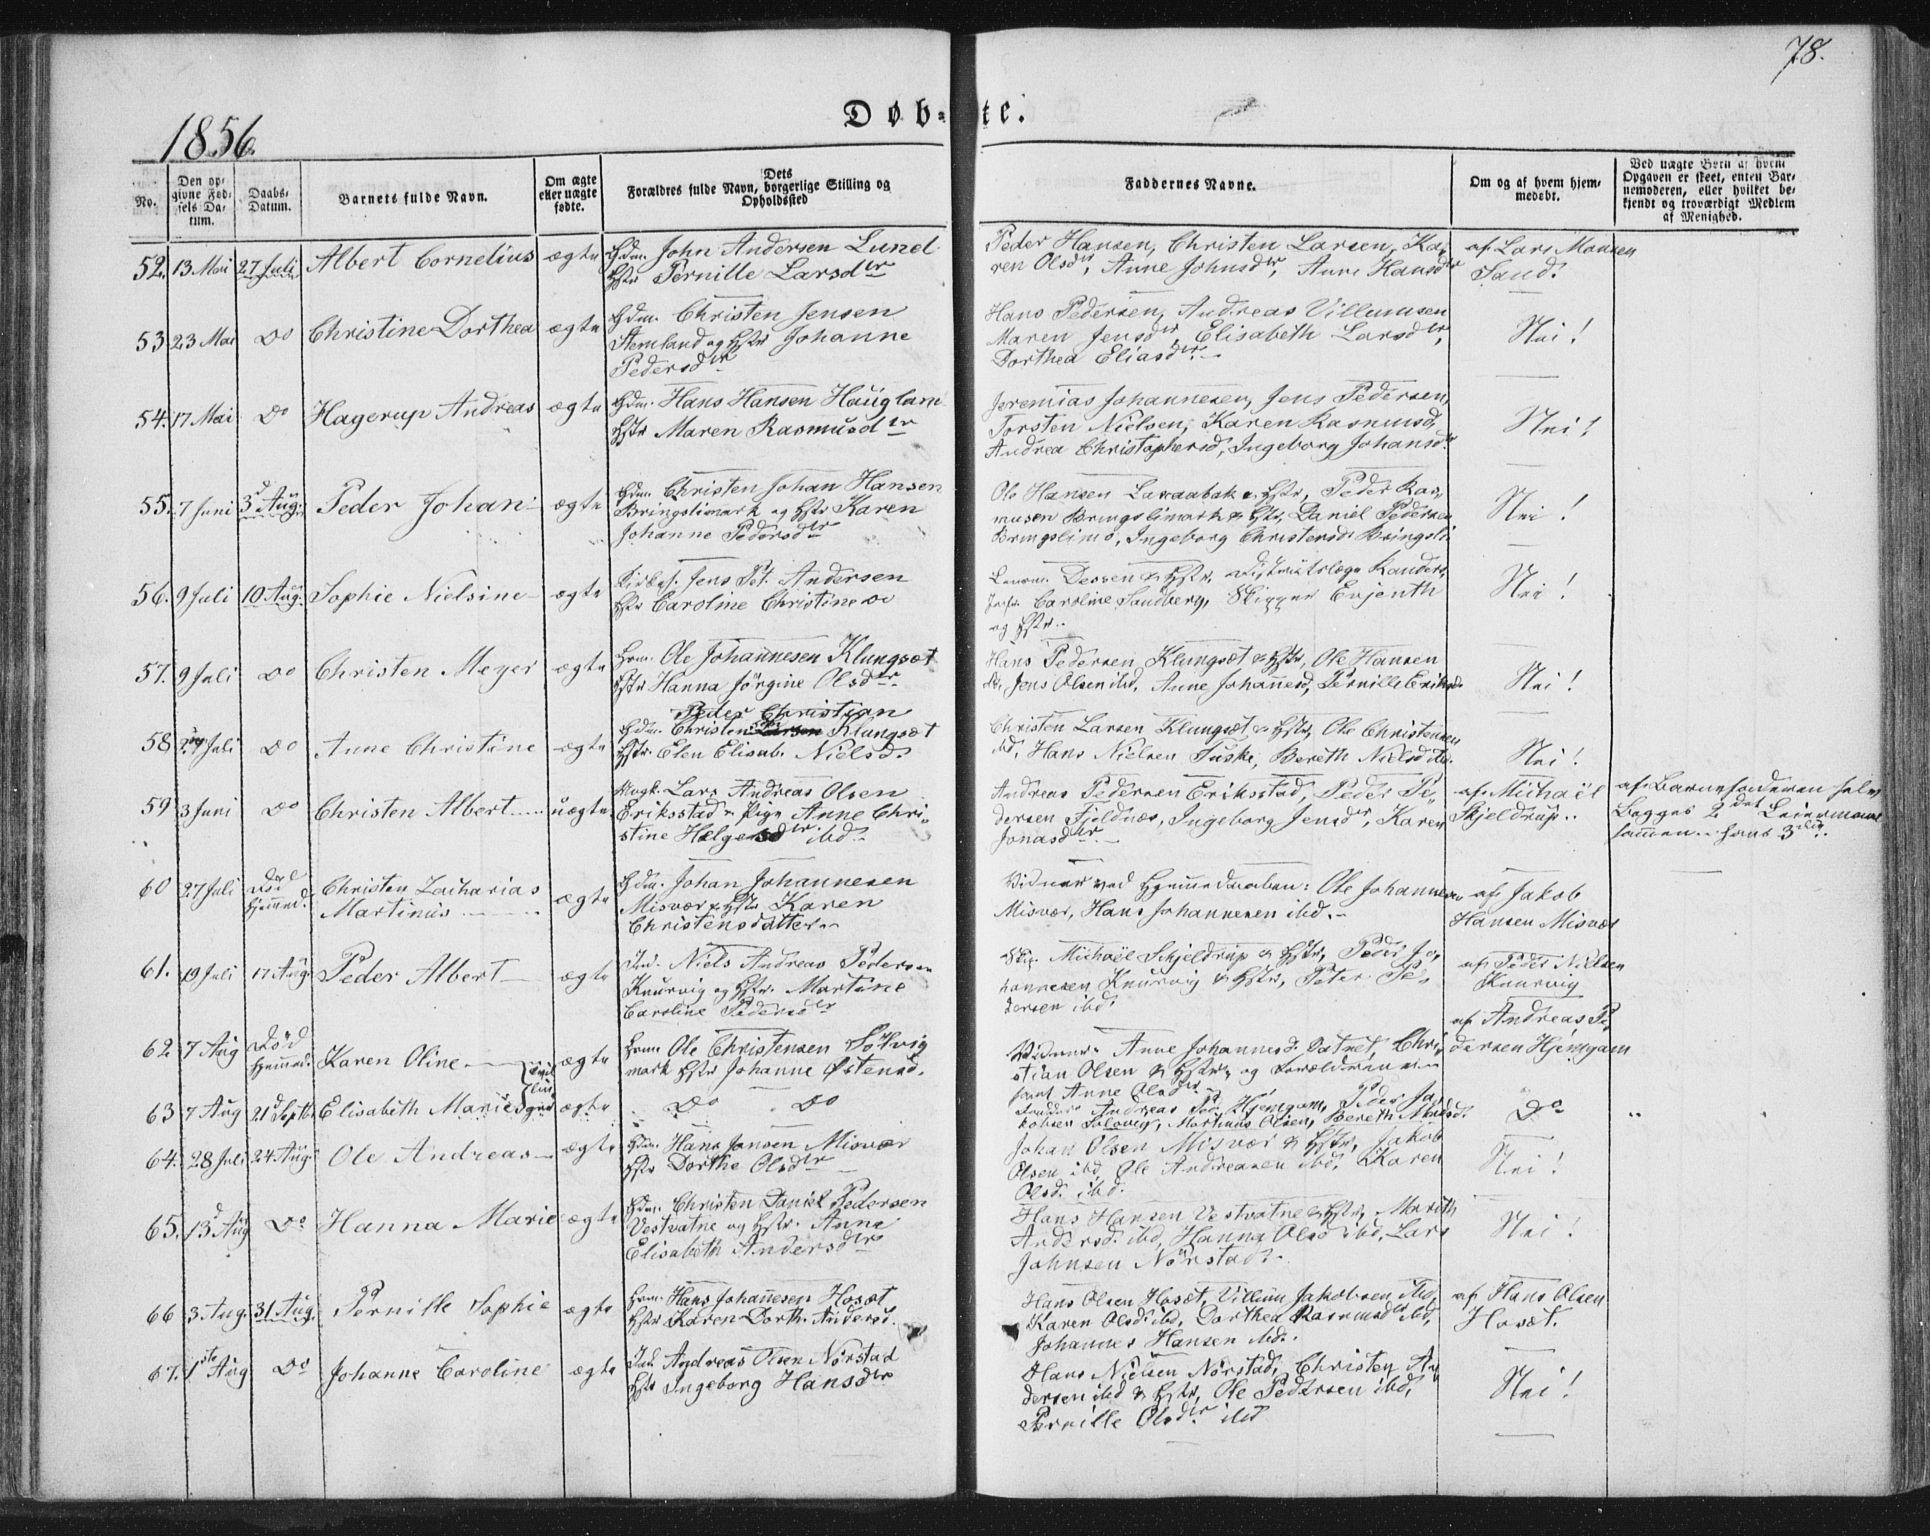 SAT, Ministerialprotokoller, klokkerbøker og fødselsregistre - Nordland, 852/L0738: Ministerialbok nr. 852A08, 1849-1865, s. 78